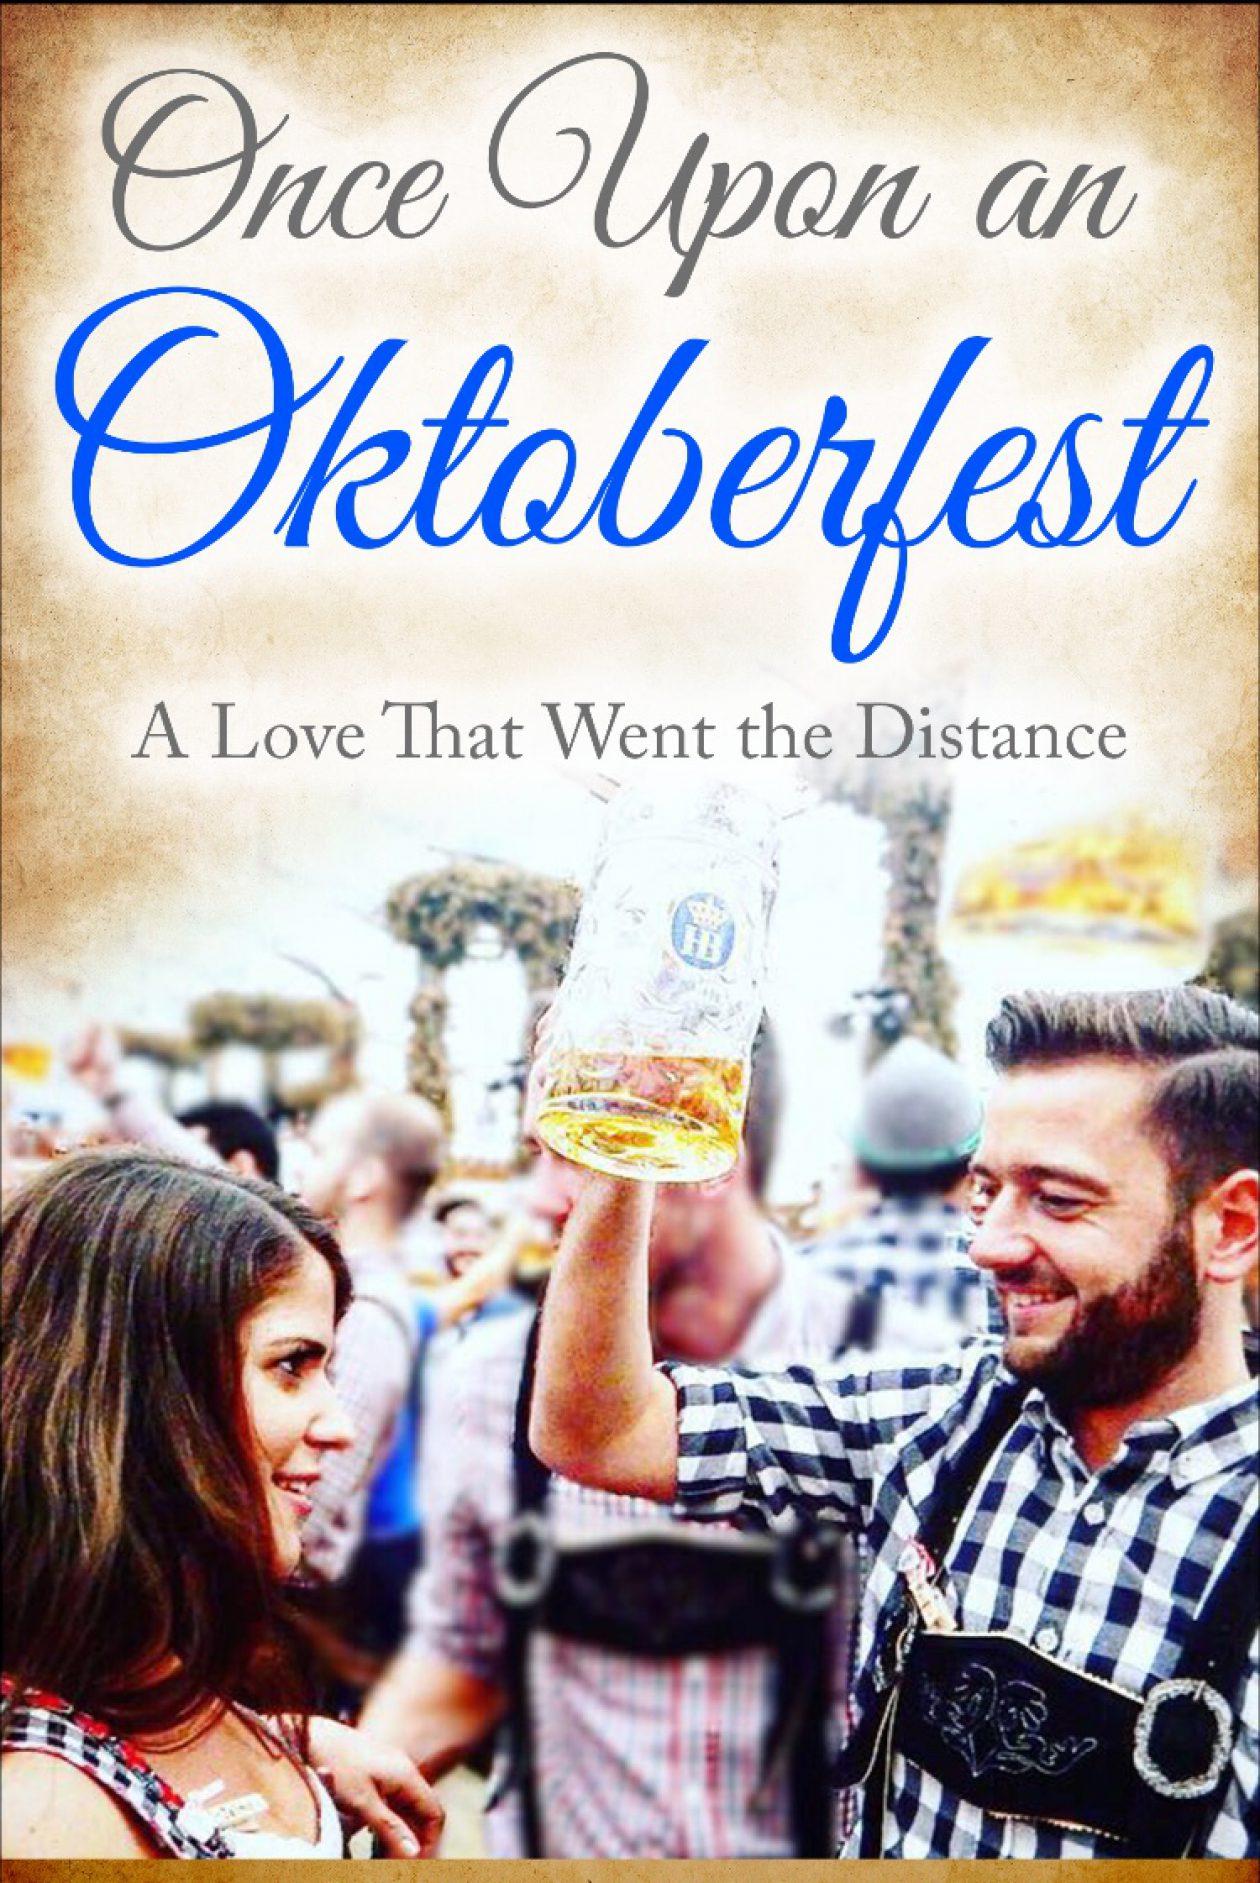 Once Upon an Oktoberfest